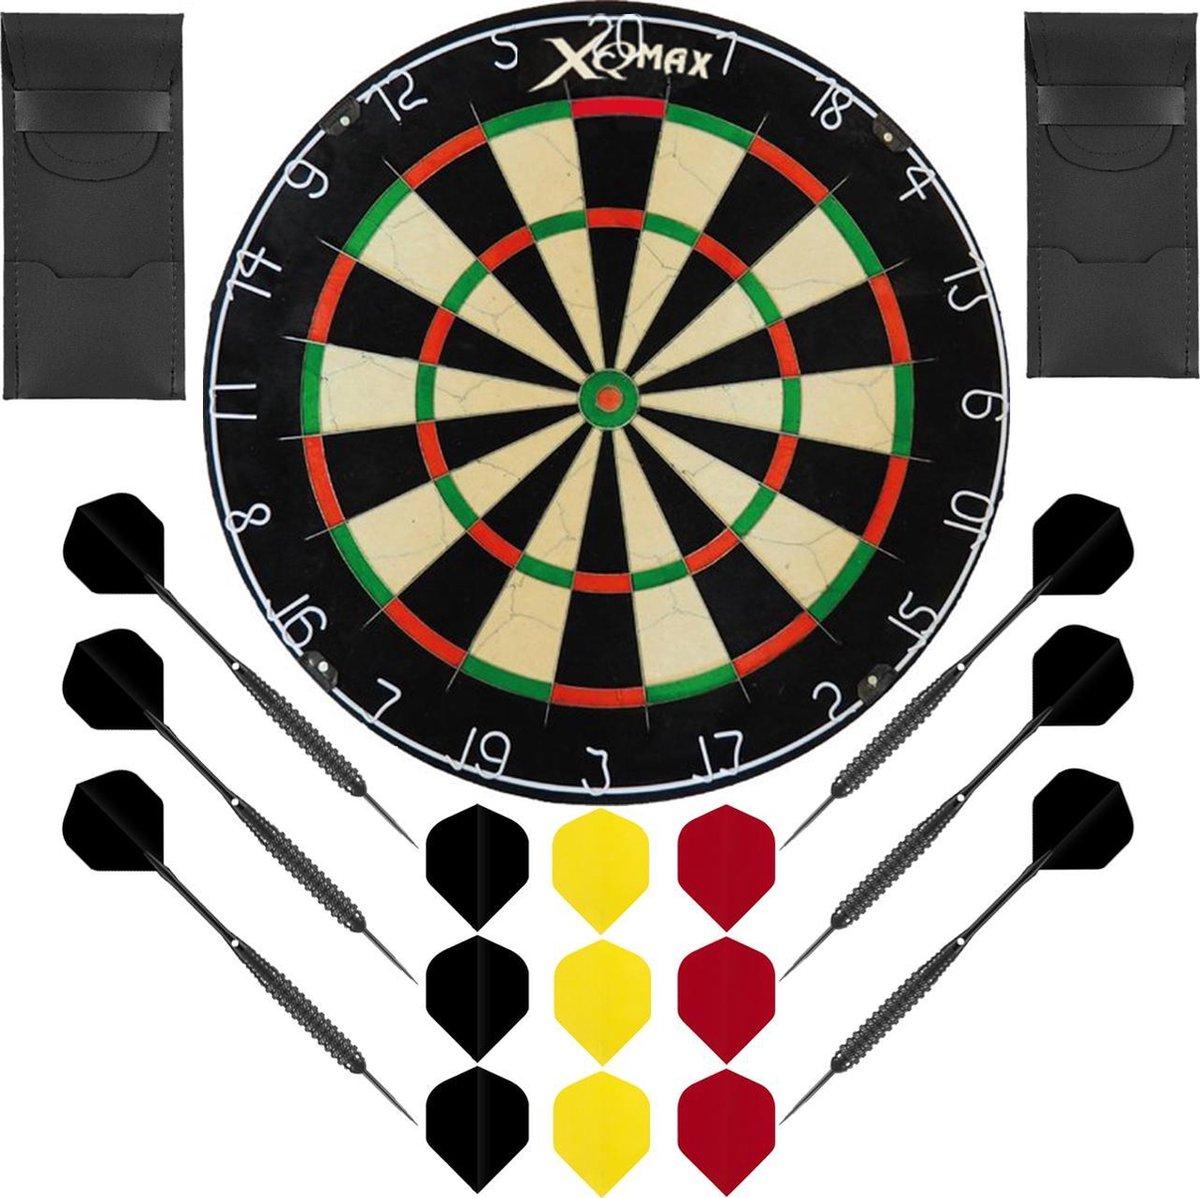 Dragon Darts Belgian Dreammaker set - dartbord - 2 sets - dartpijlen - dart shafts - dart flights - Plain XQ Max dartbord